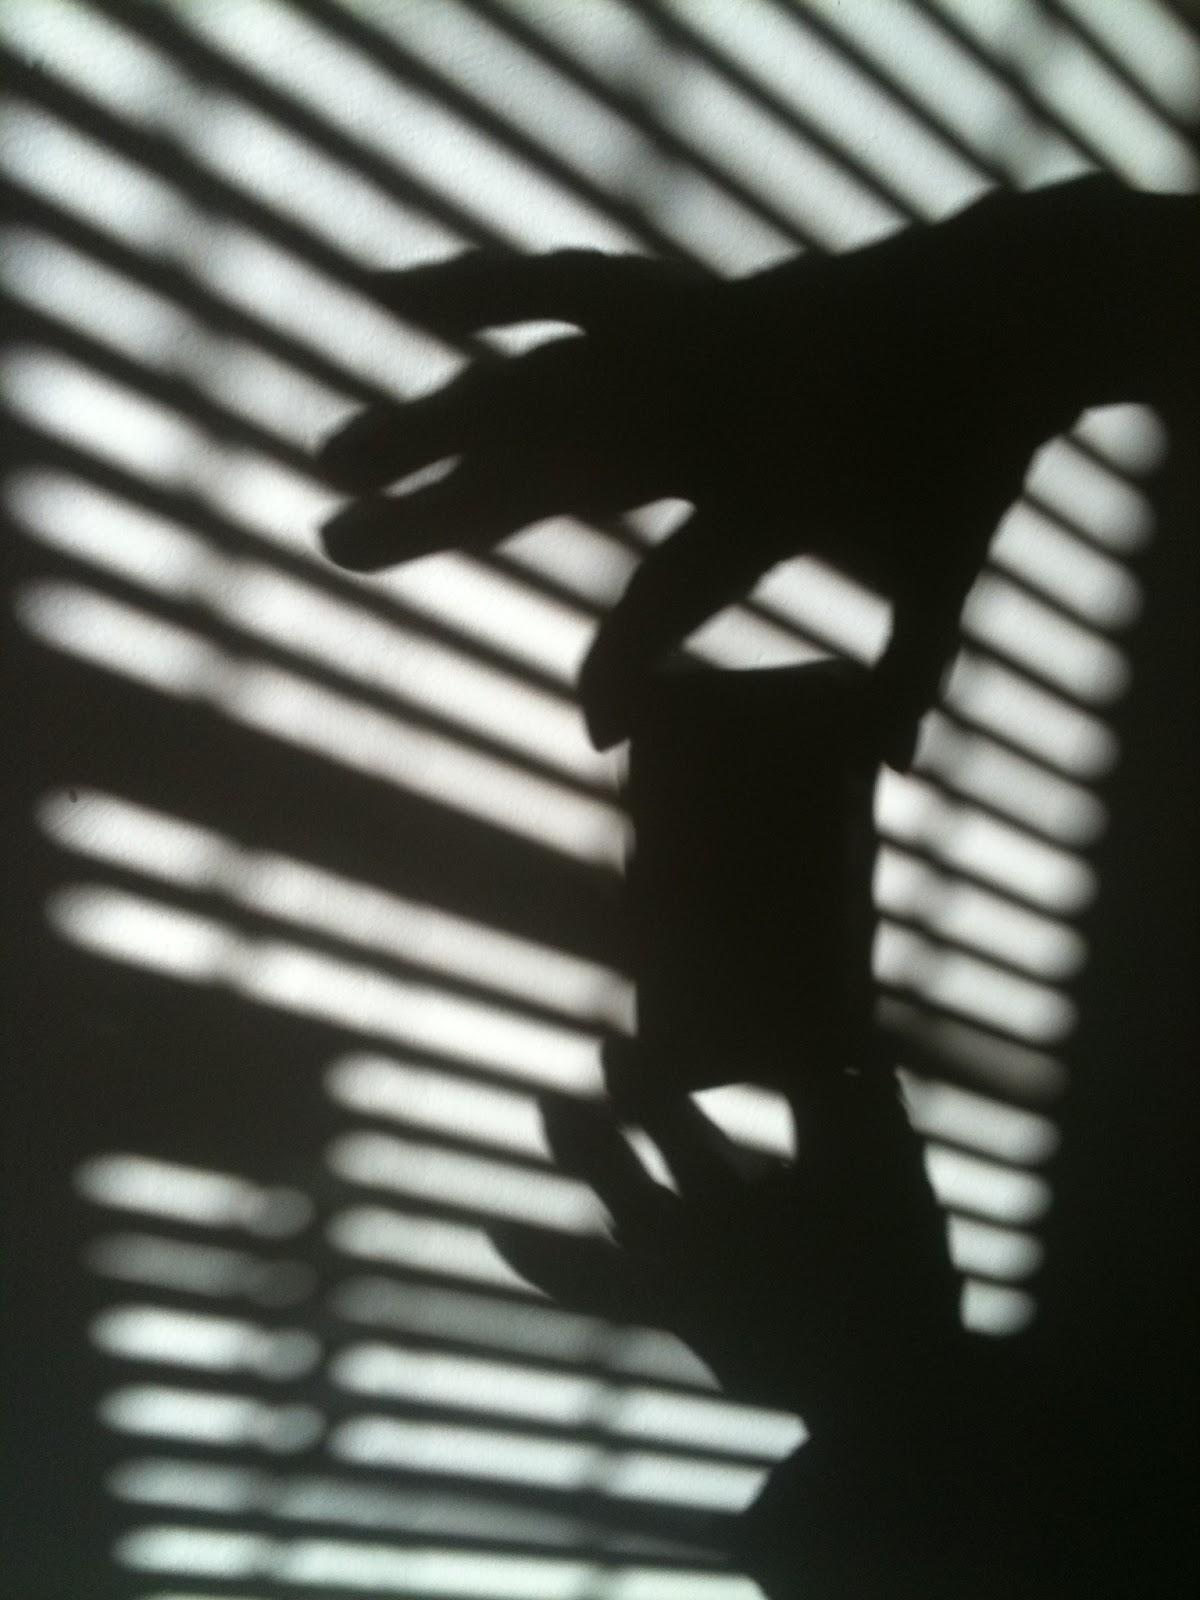 Camera phone shadow